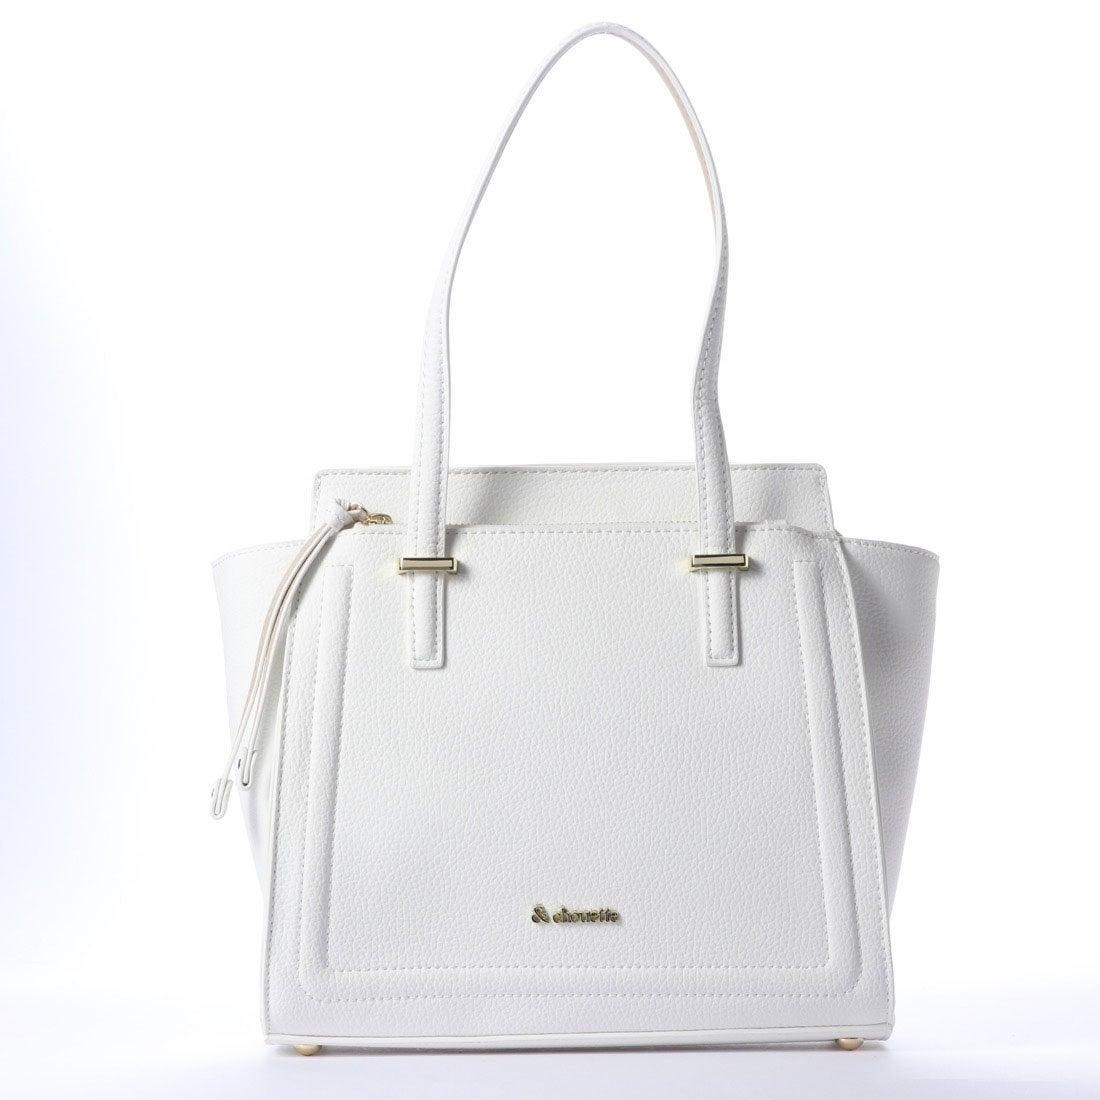 7b67f15902c4 & chouette &シュエット スクエアソフトエコレザーハンドバッグ(ホワイト) -靴&ファッション通販 ロコンド〜自宅で試着、気軽に返品